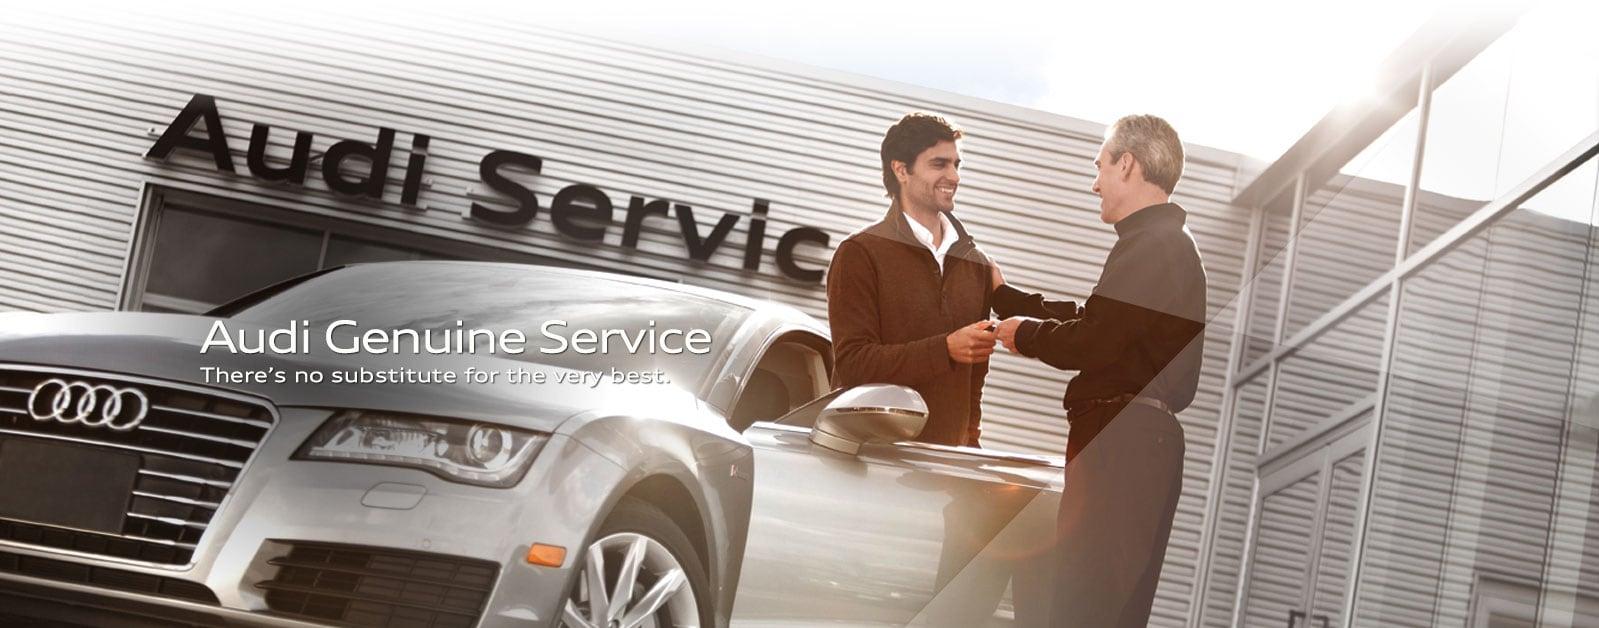 Vehicle Maintenance Blog Post List Audi Richfield Audi Dealer Near - Audi car maintenance costs